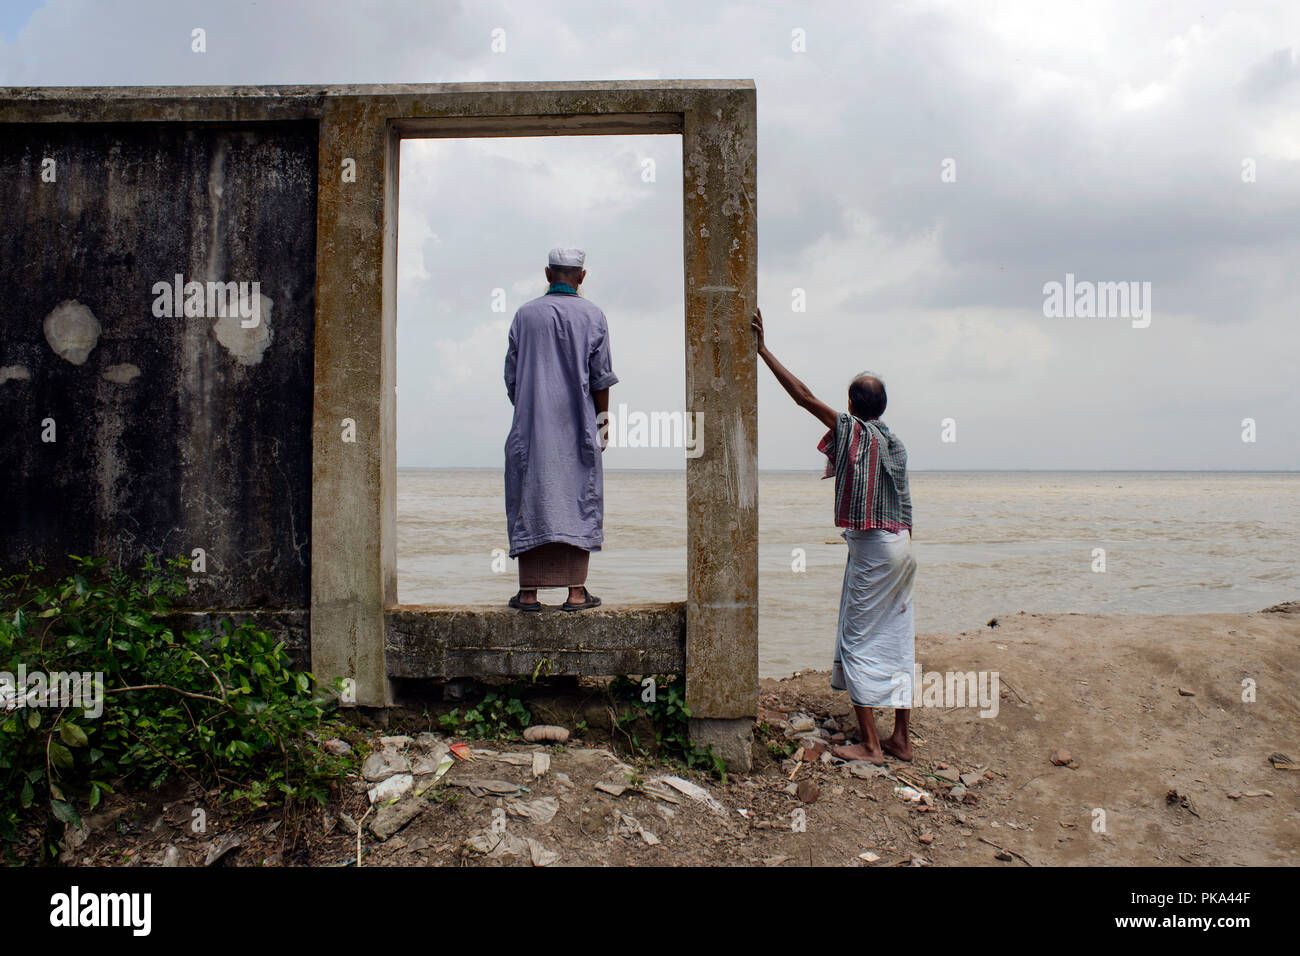 The Terrible Breakdown Of the Padma River in Bangladesh - Stock Image